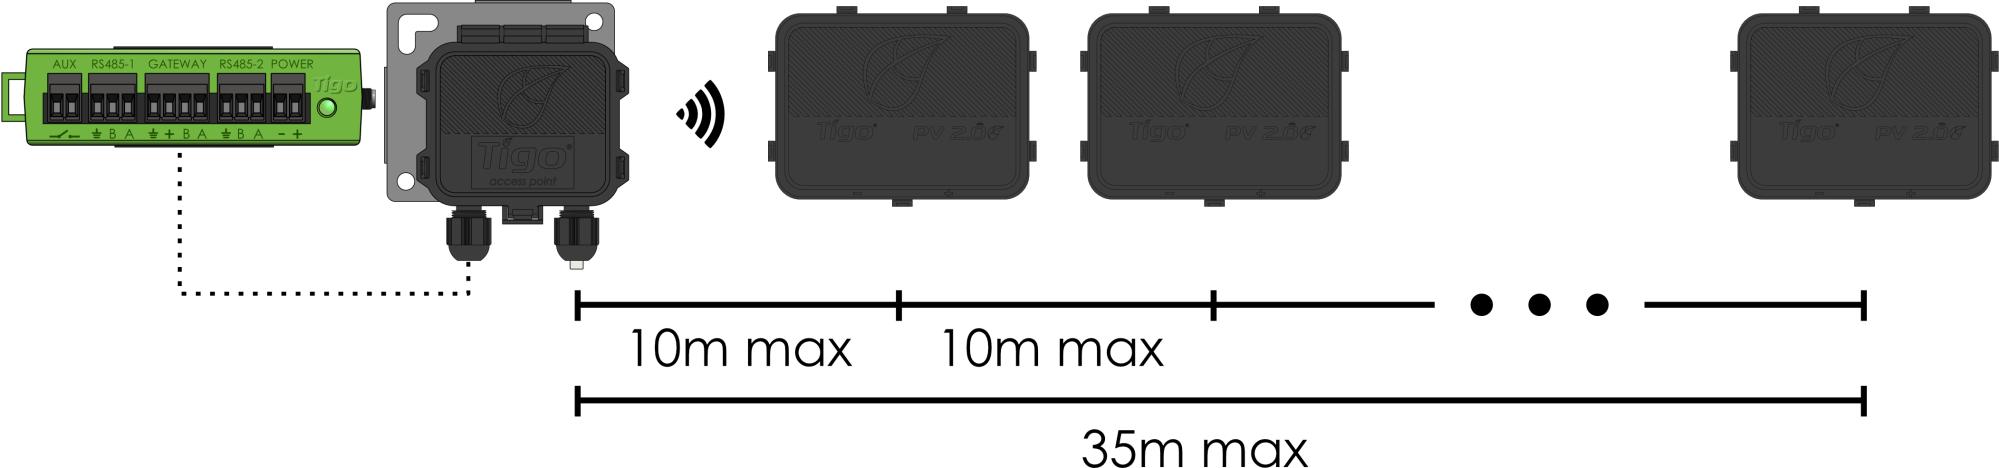 hight resolution of cca tap range diagram png